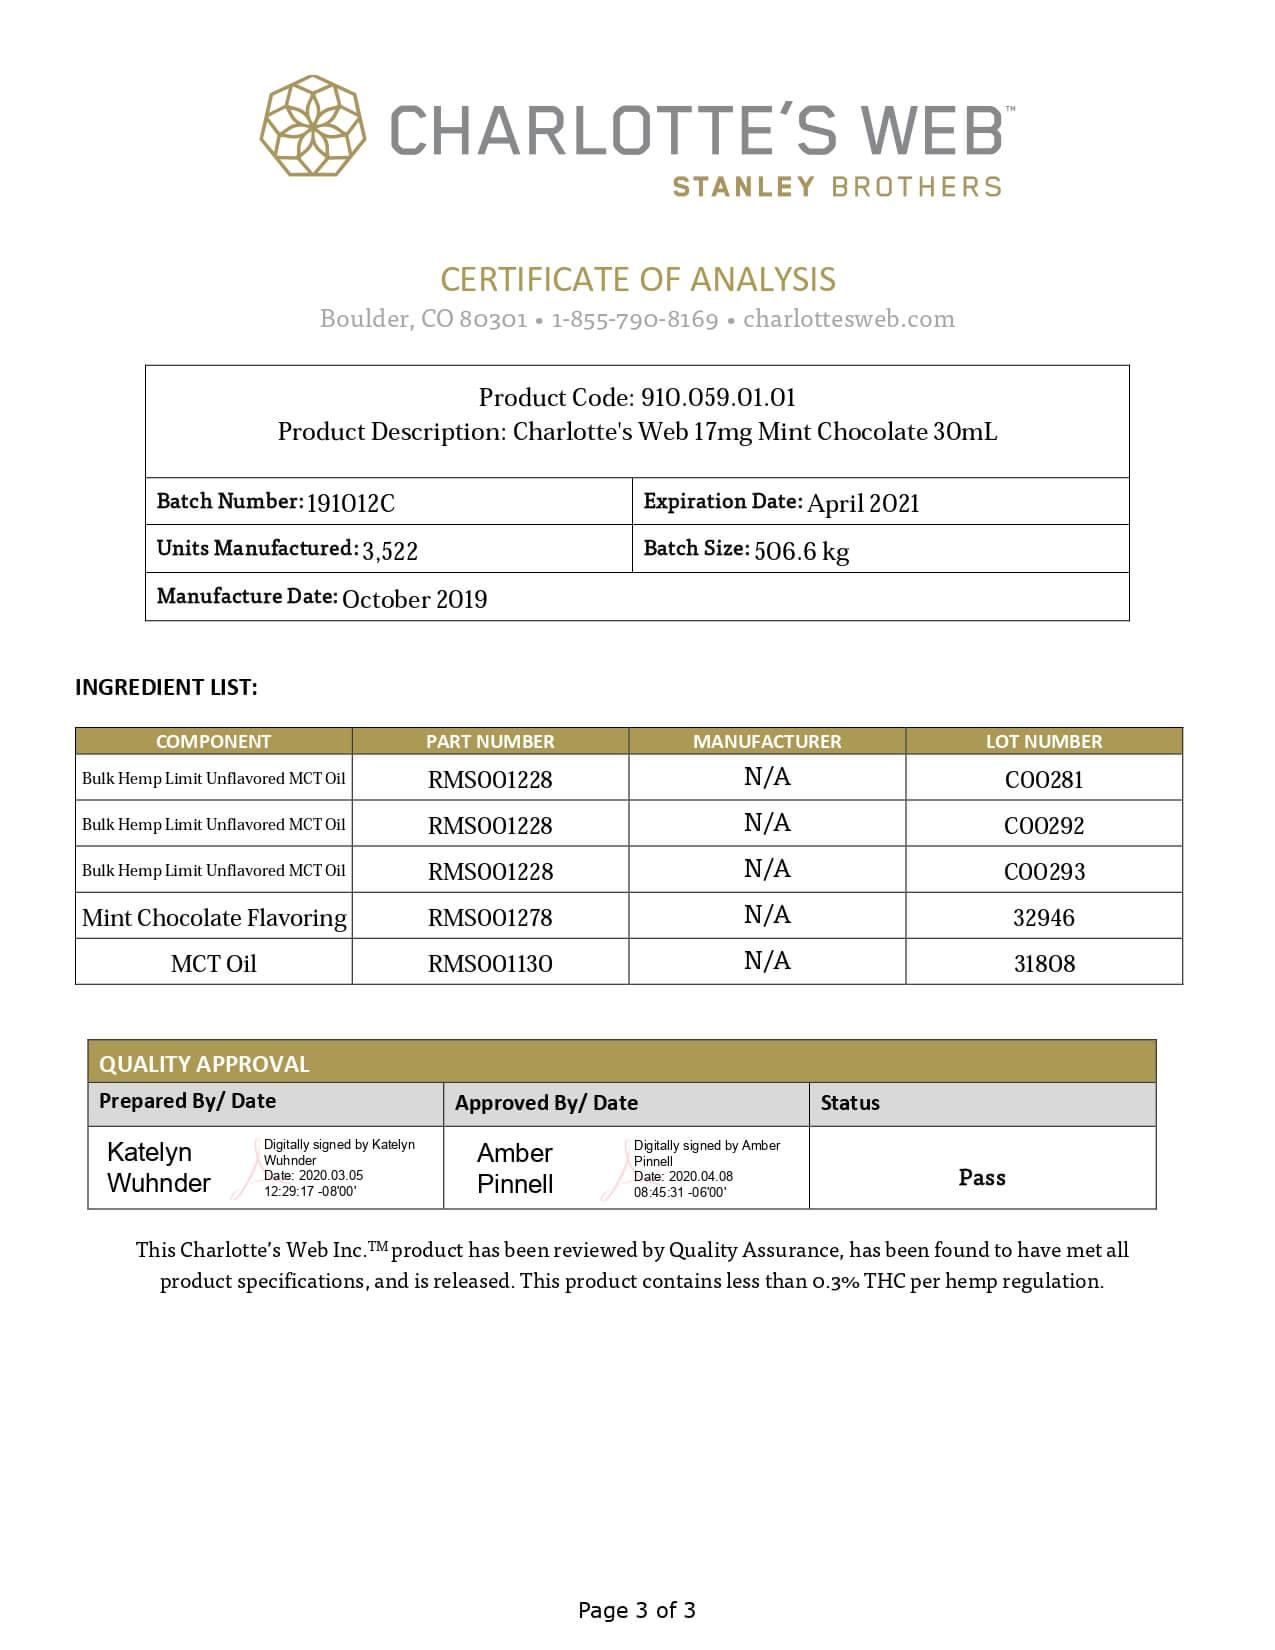 Charlottes Web Full Spectrum Mint Chocolate 17mg 1ml Lab Report